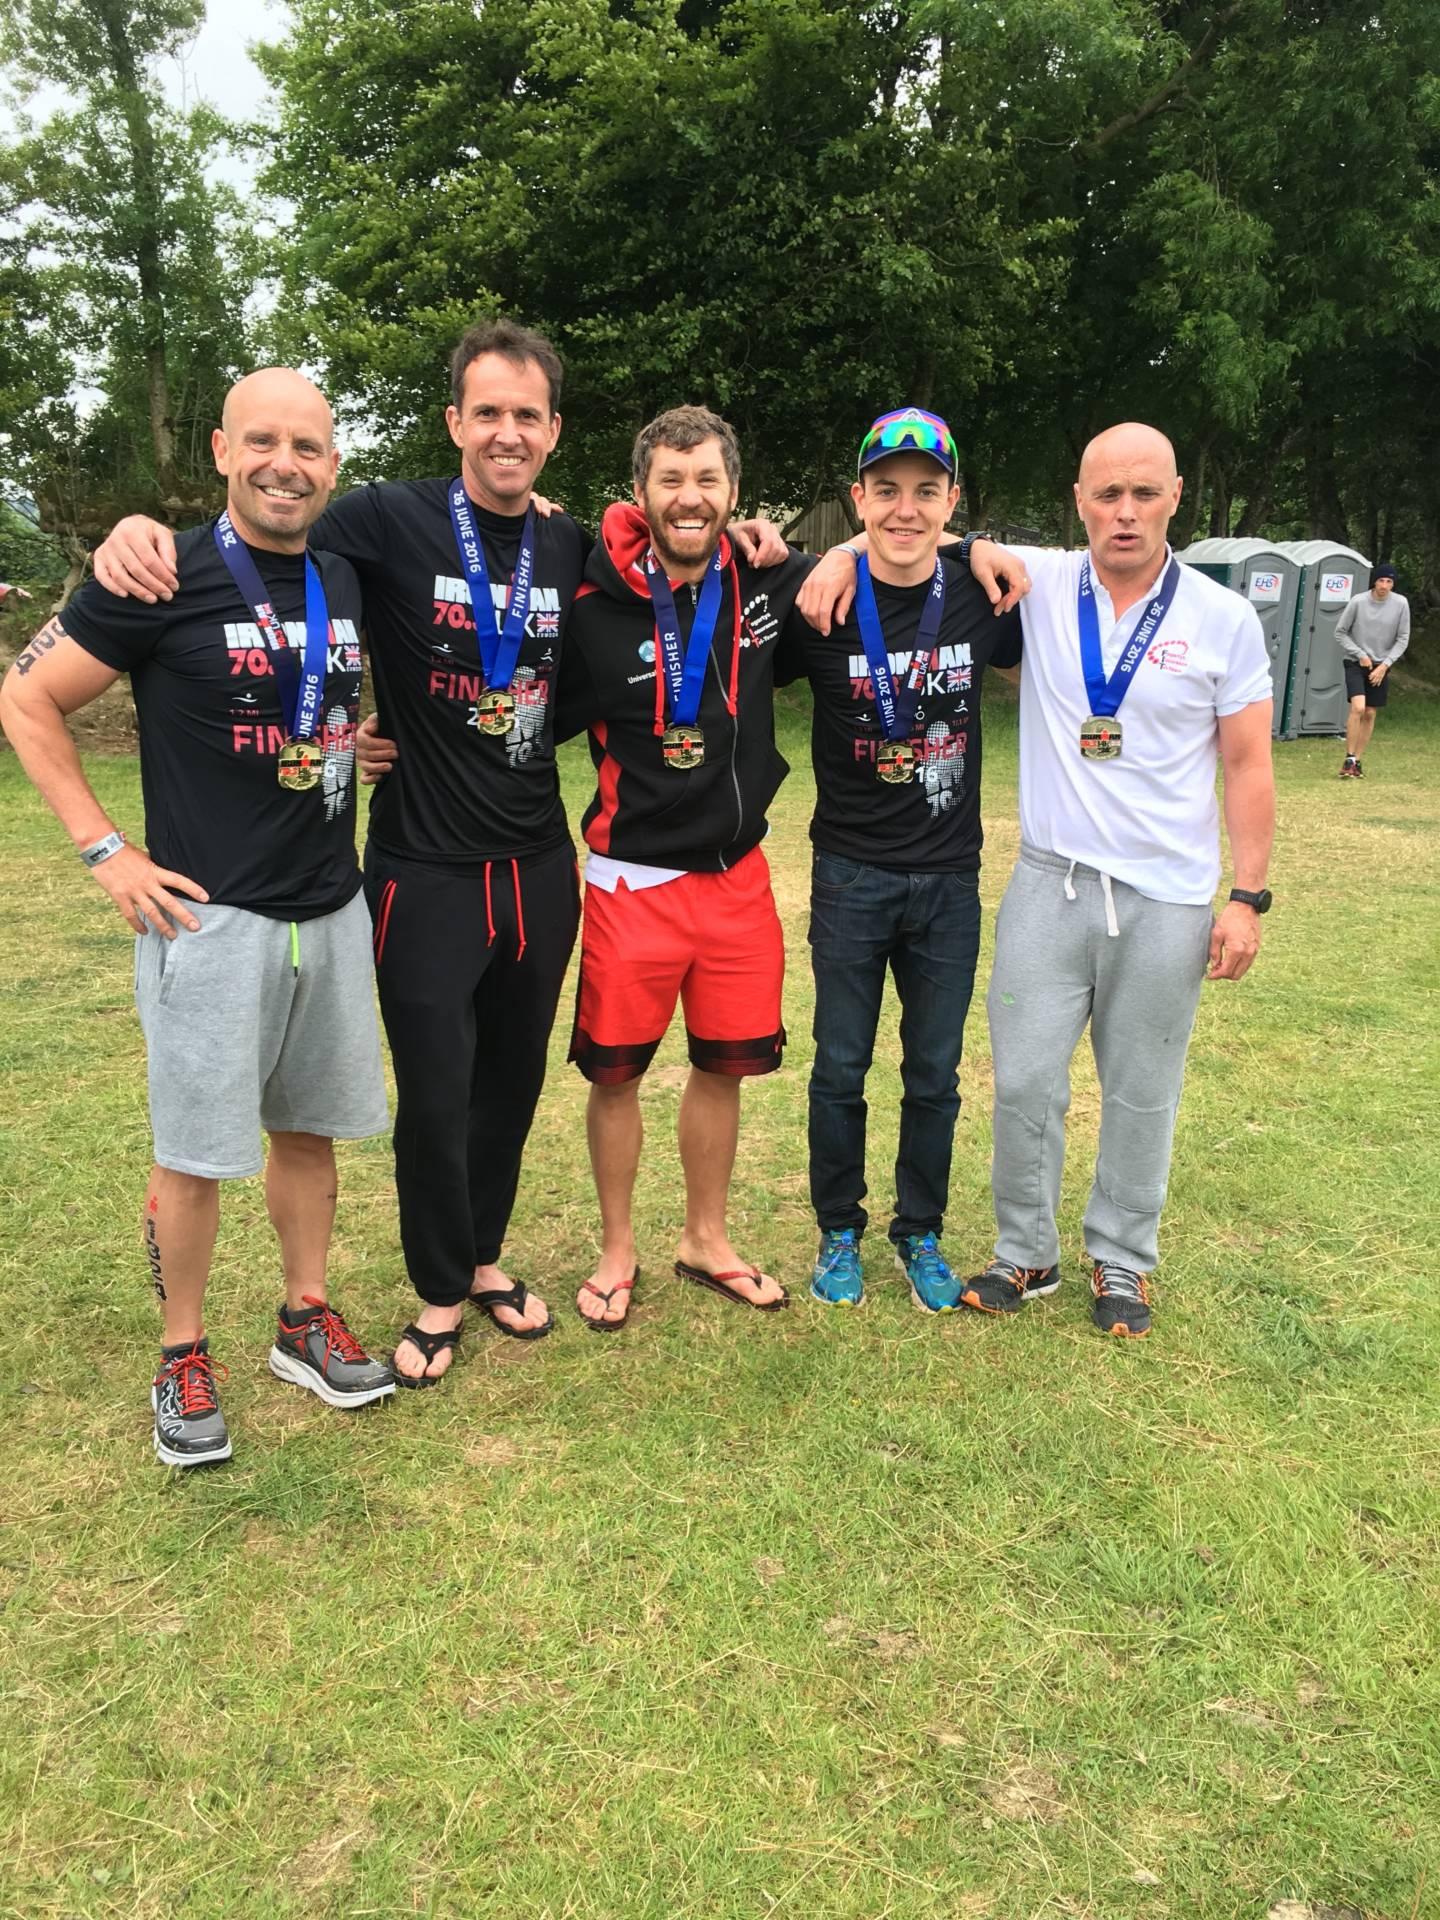 Brian just misses the Podium at Exmoor Ironman – Shaun Wins Lancaster Half-Marathon – Mark Wins V40 at Lakes Triathlon